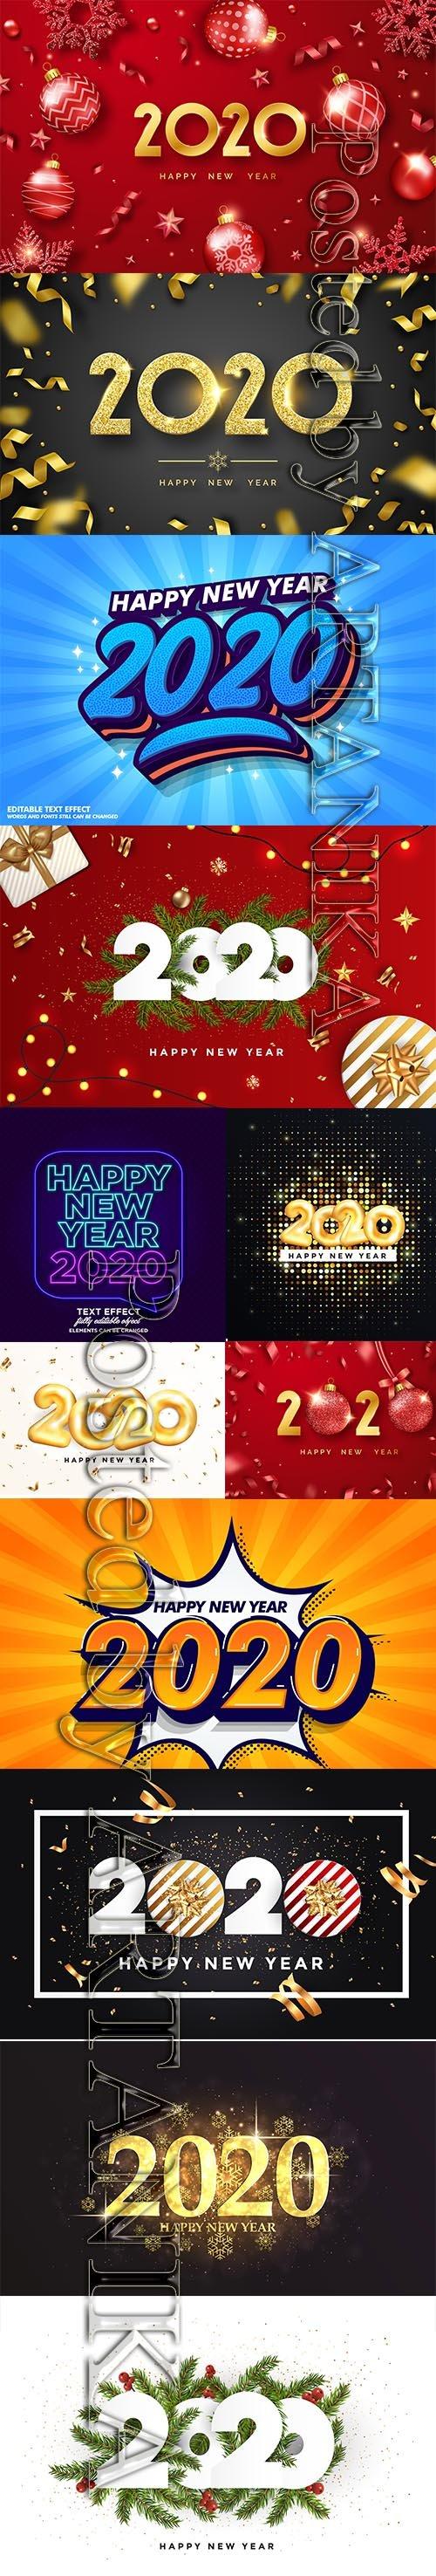 Vector Set - New Year 2020 Illustartions Pack Vol 2